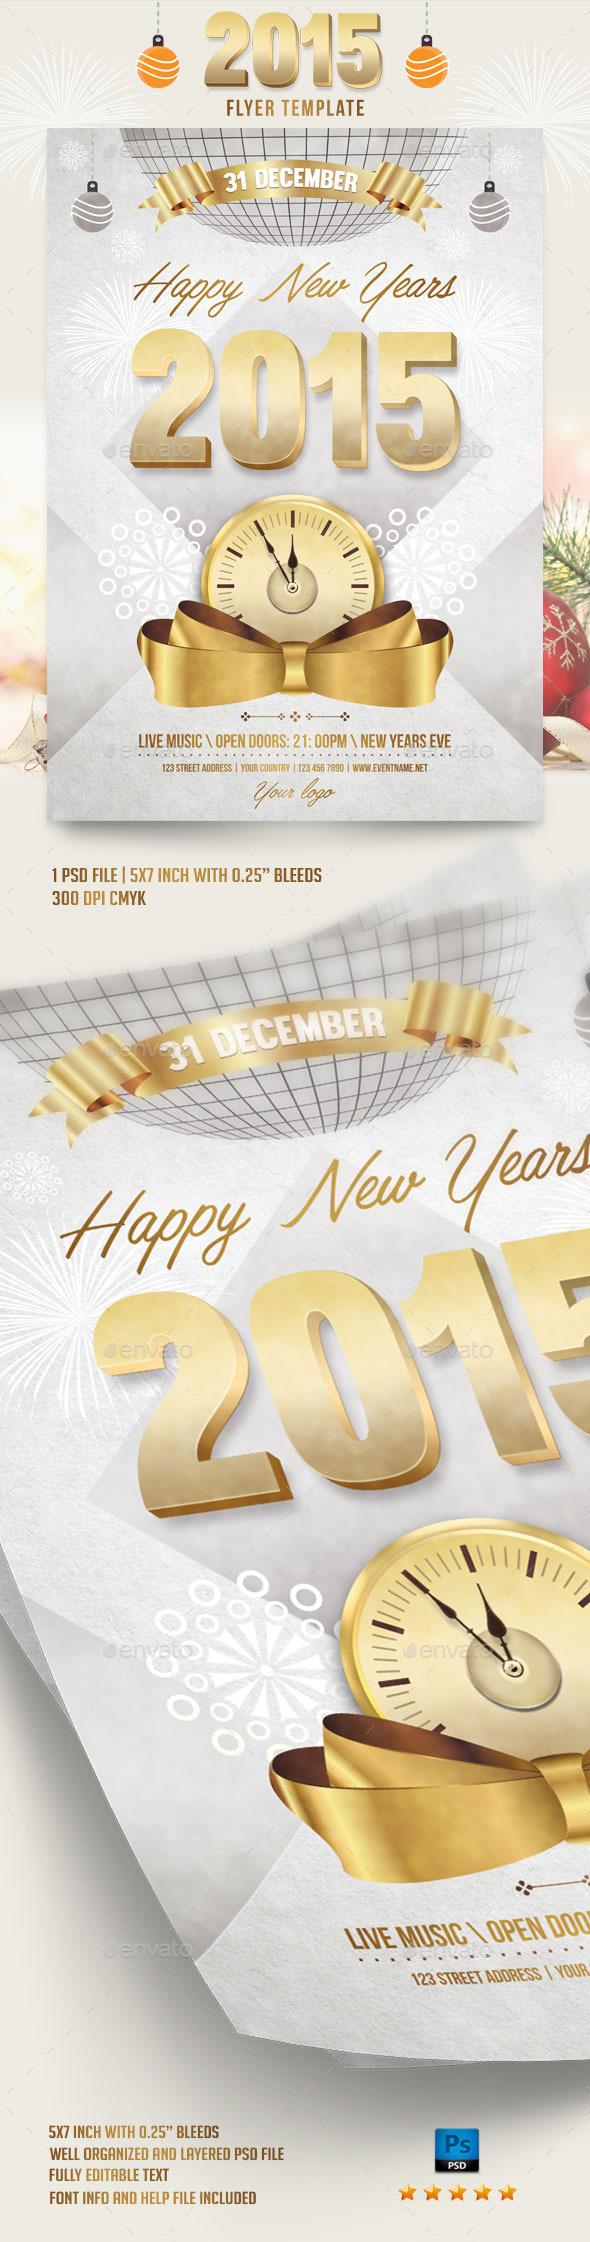 2015 Flyer Template - Flyers Print Templates